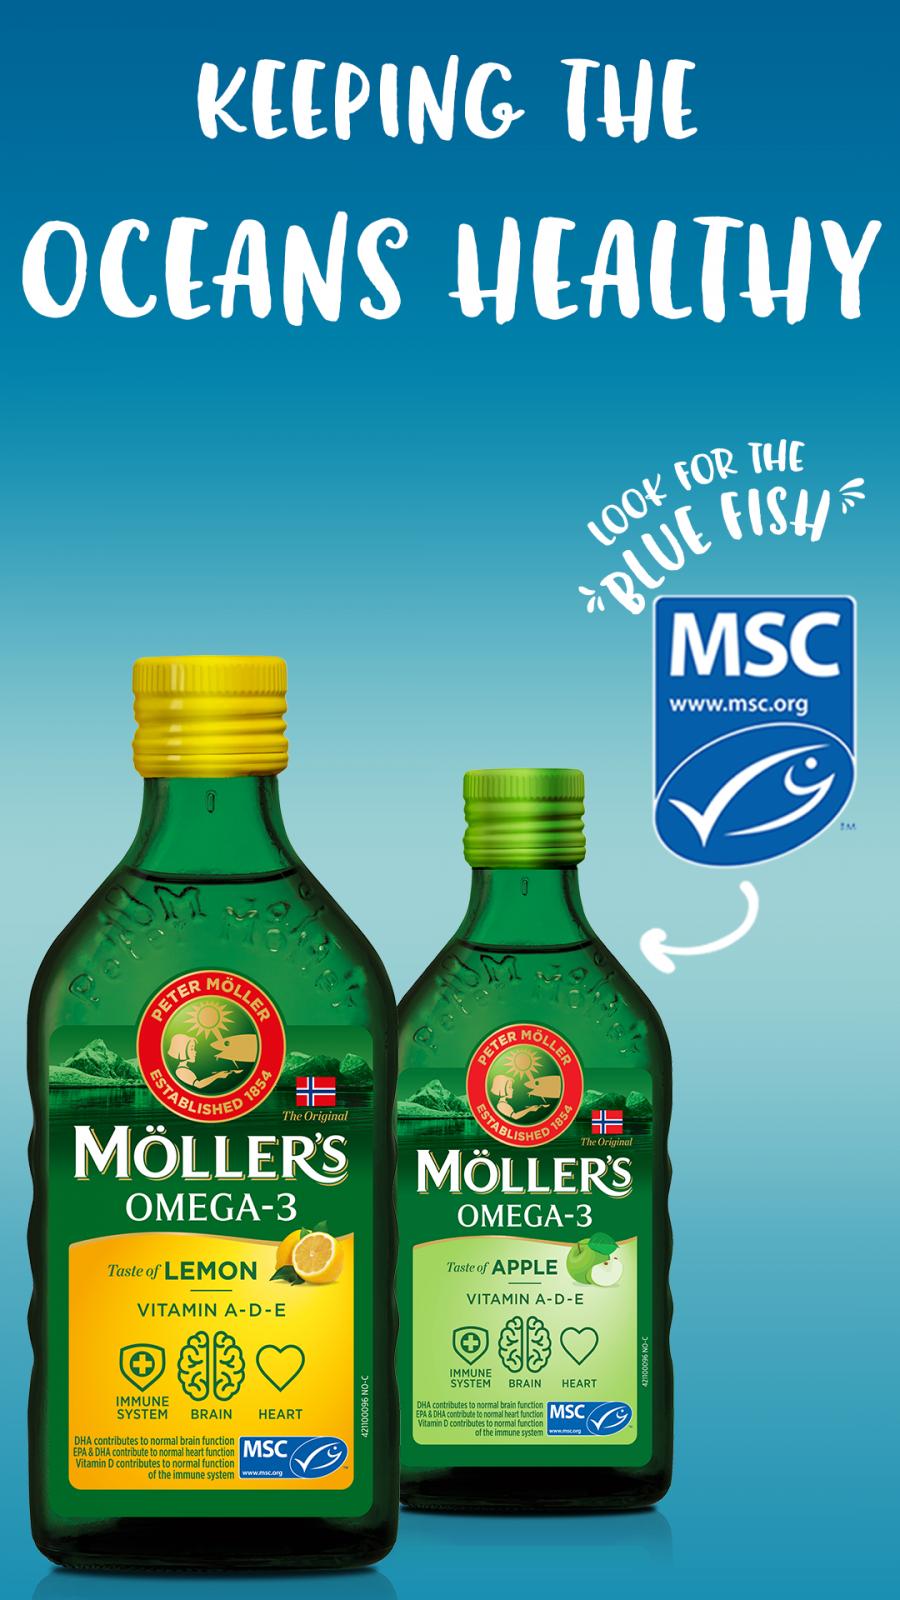 Mollers Molers Moler sirup syrup cod liver oil Omega-3 Молерс Молер Омега-3 Витамин-Д Vitamin-D Vitamin-A